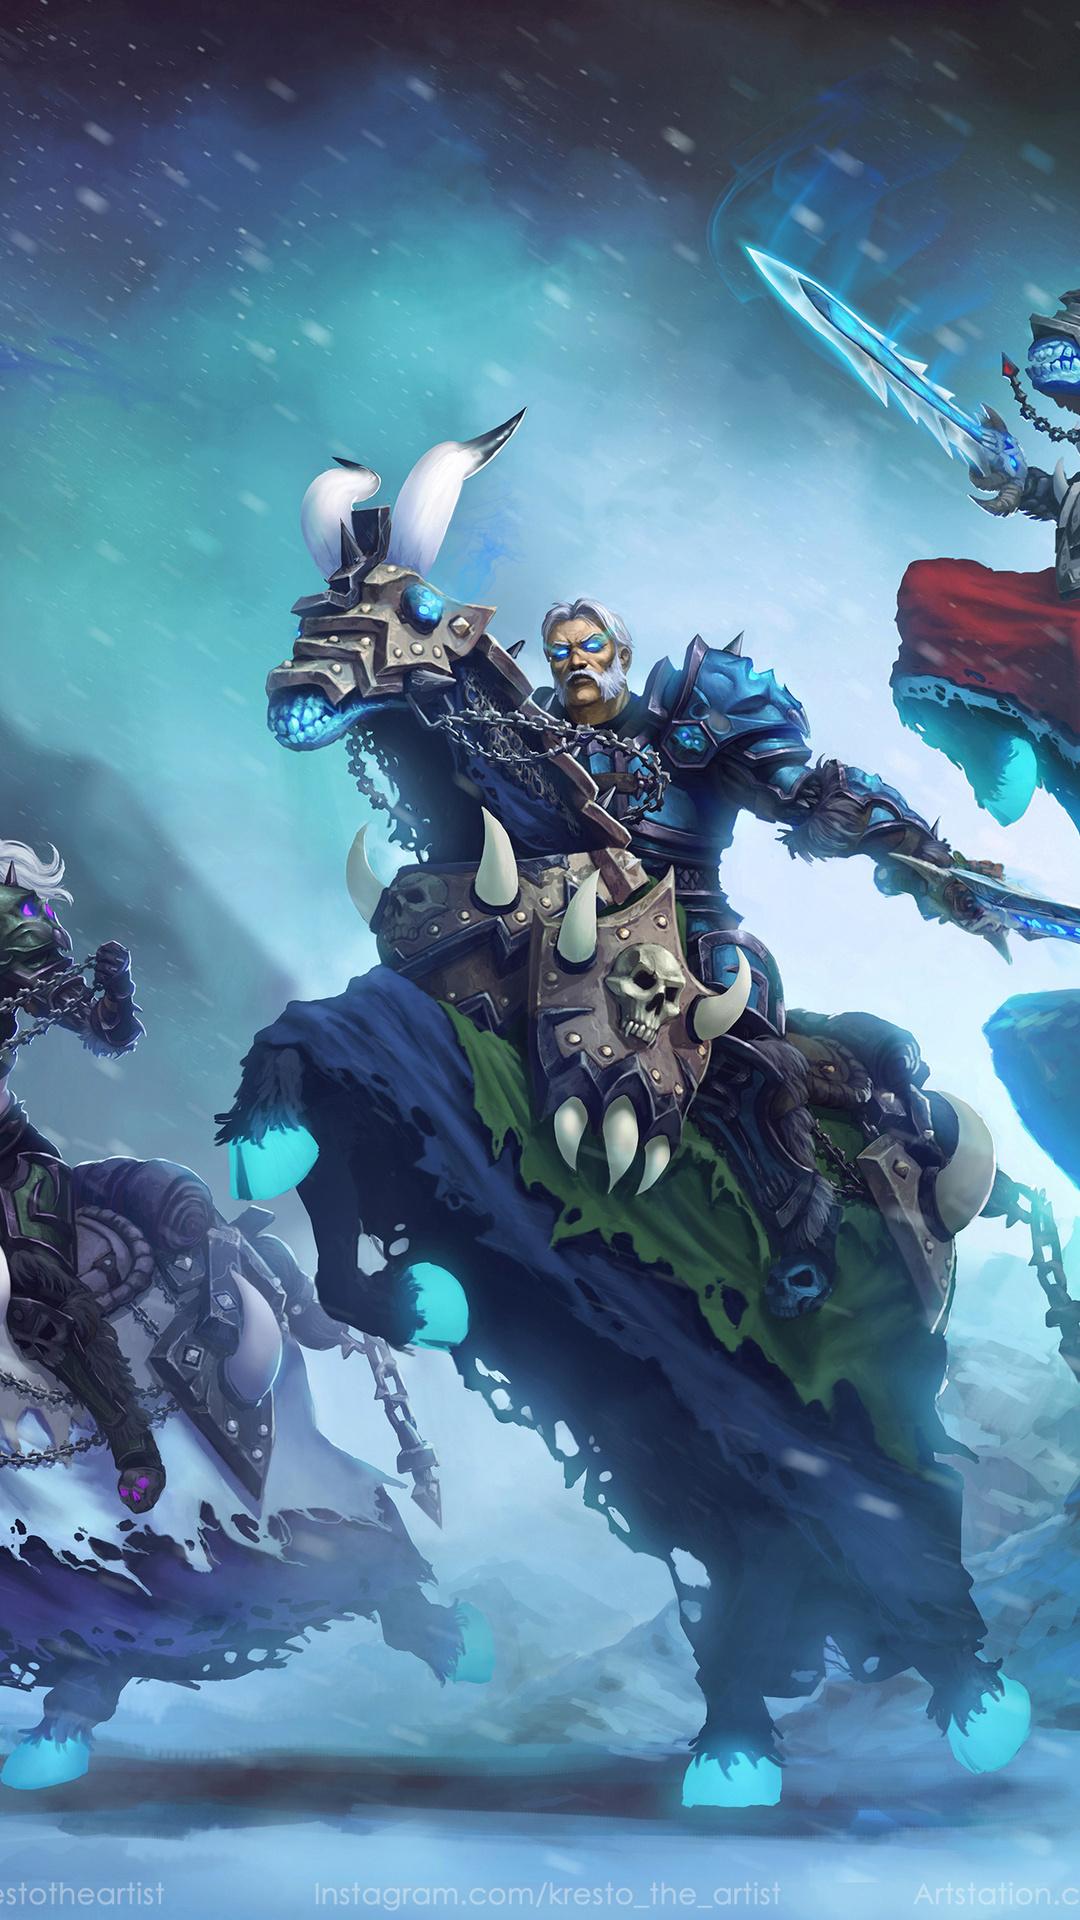 four-horsemen-of-the-apocalypse-4k-jw.jpg